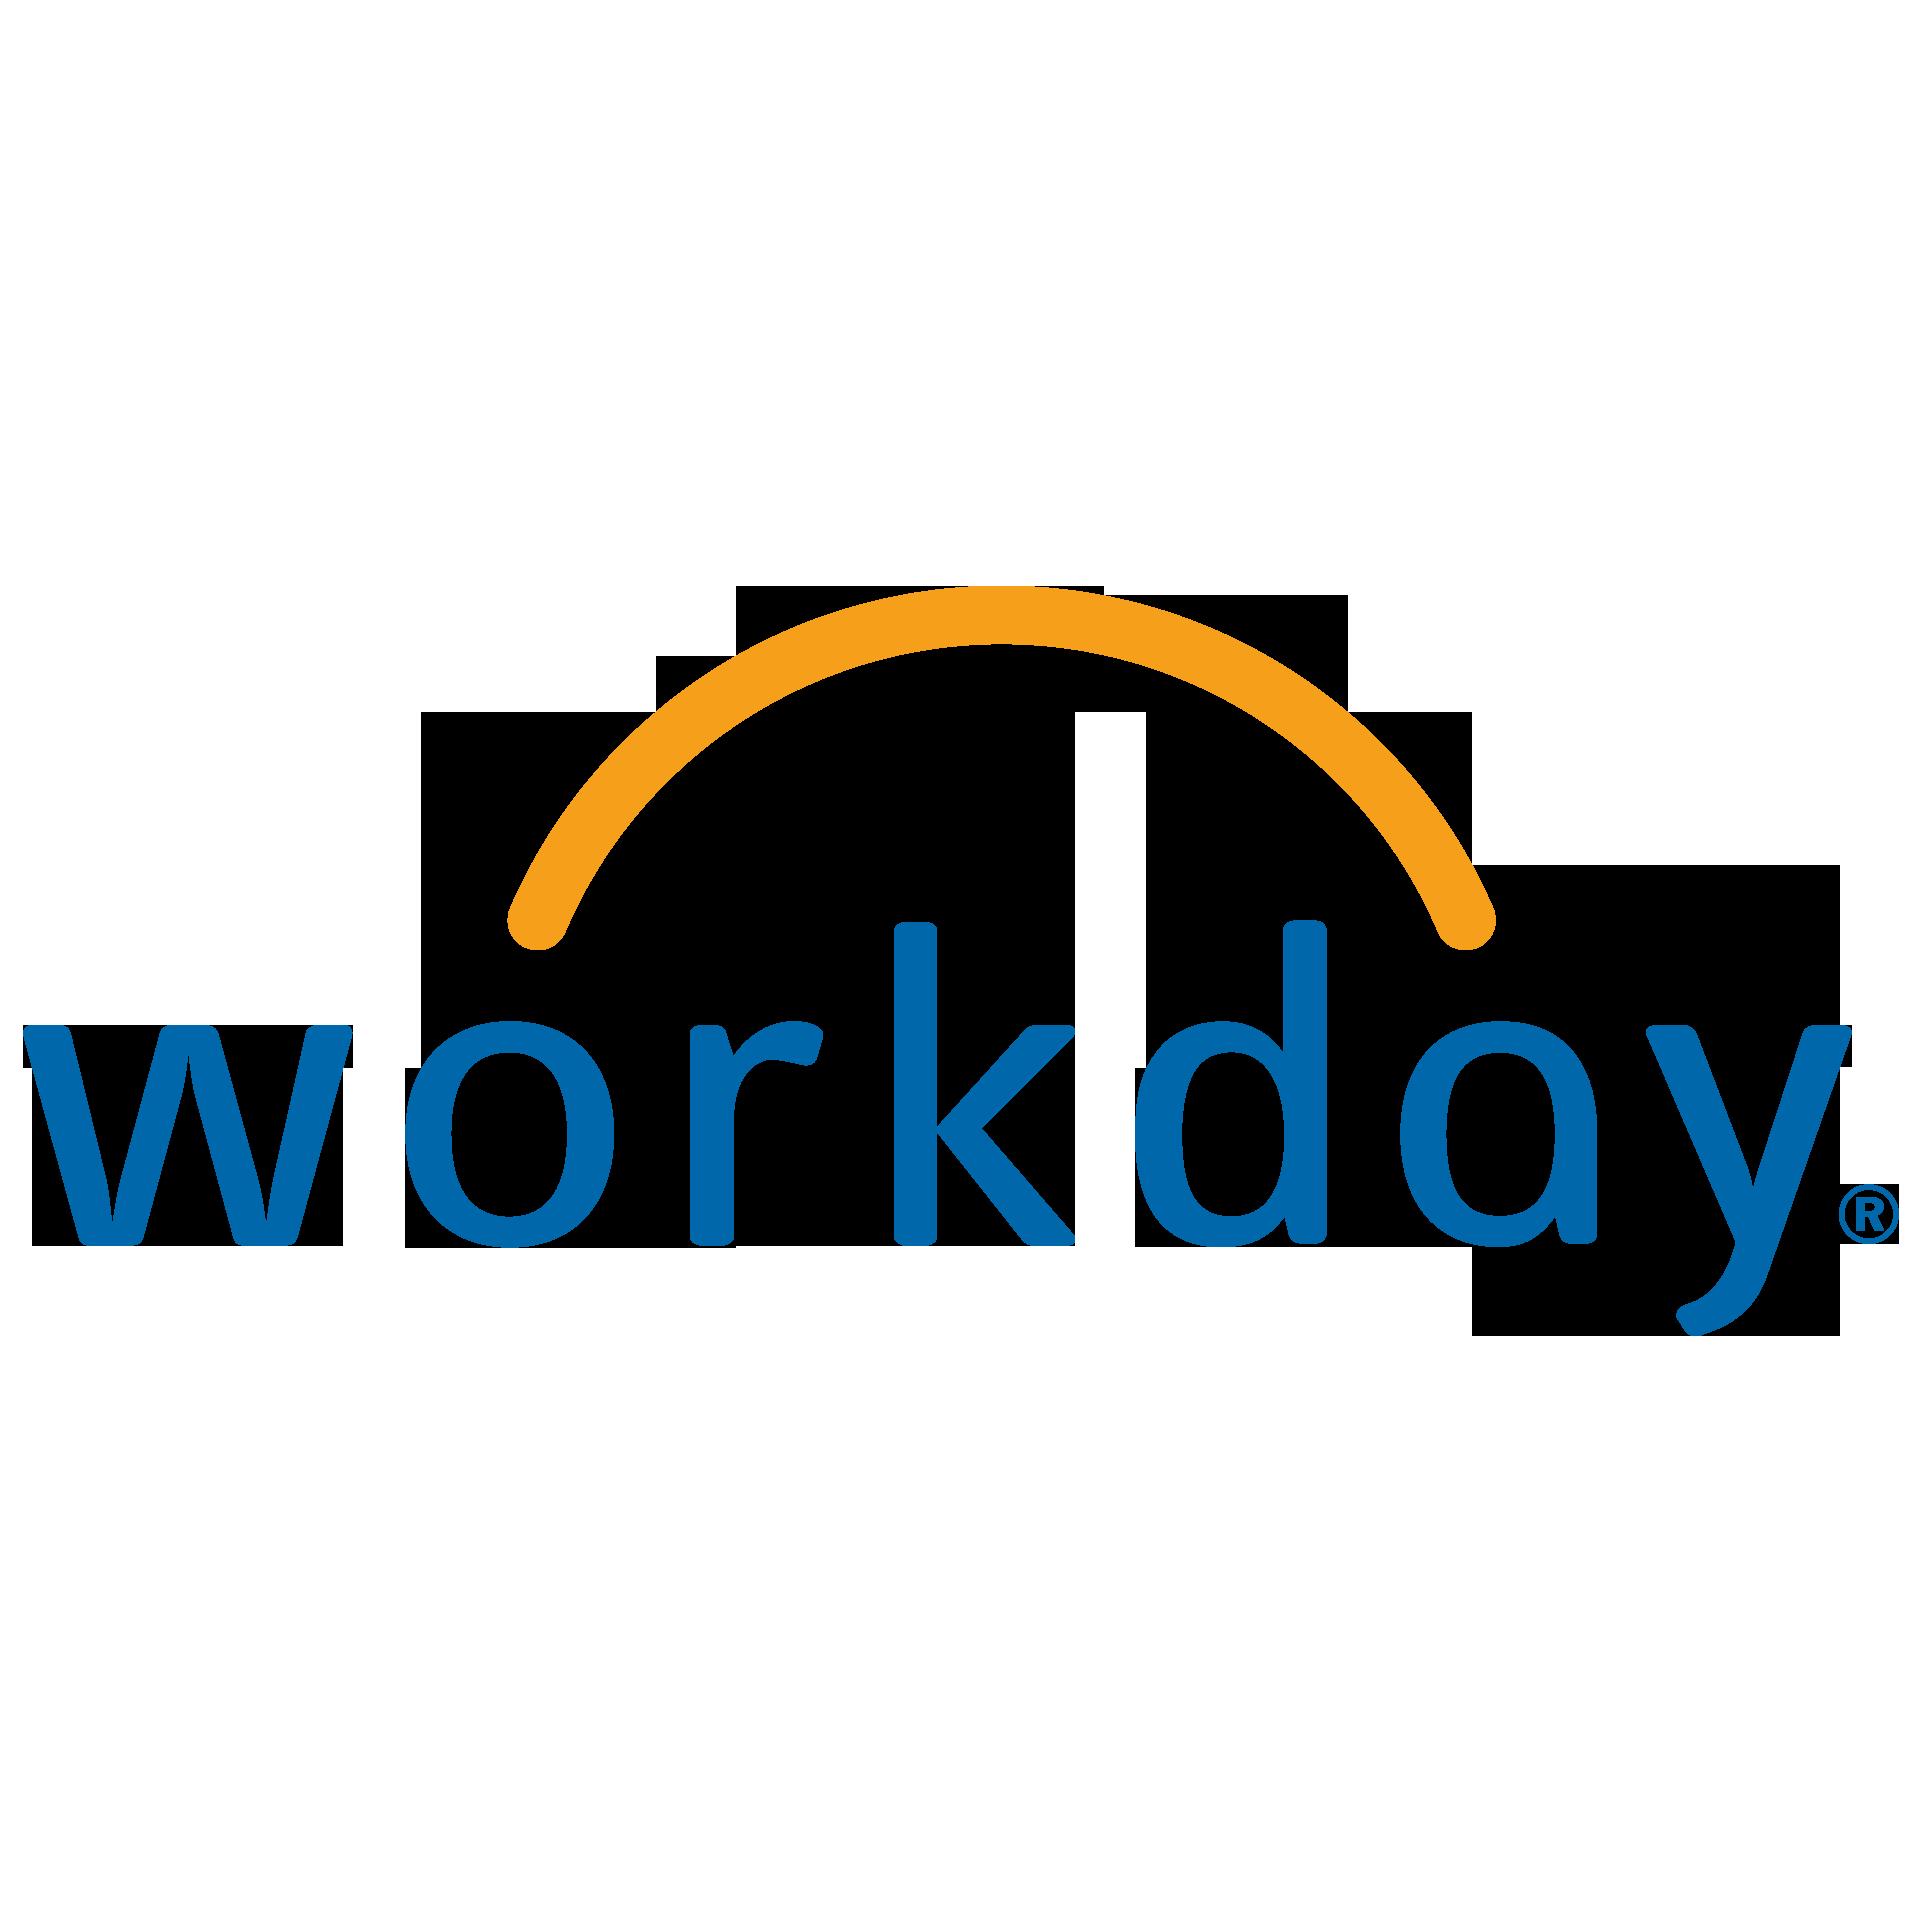 kisspng-workday-inc-cloud-computing-human-resource-manag-human-resource-5acbc245bdadb5.0329187015233029817769